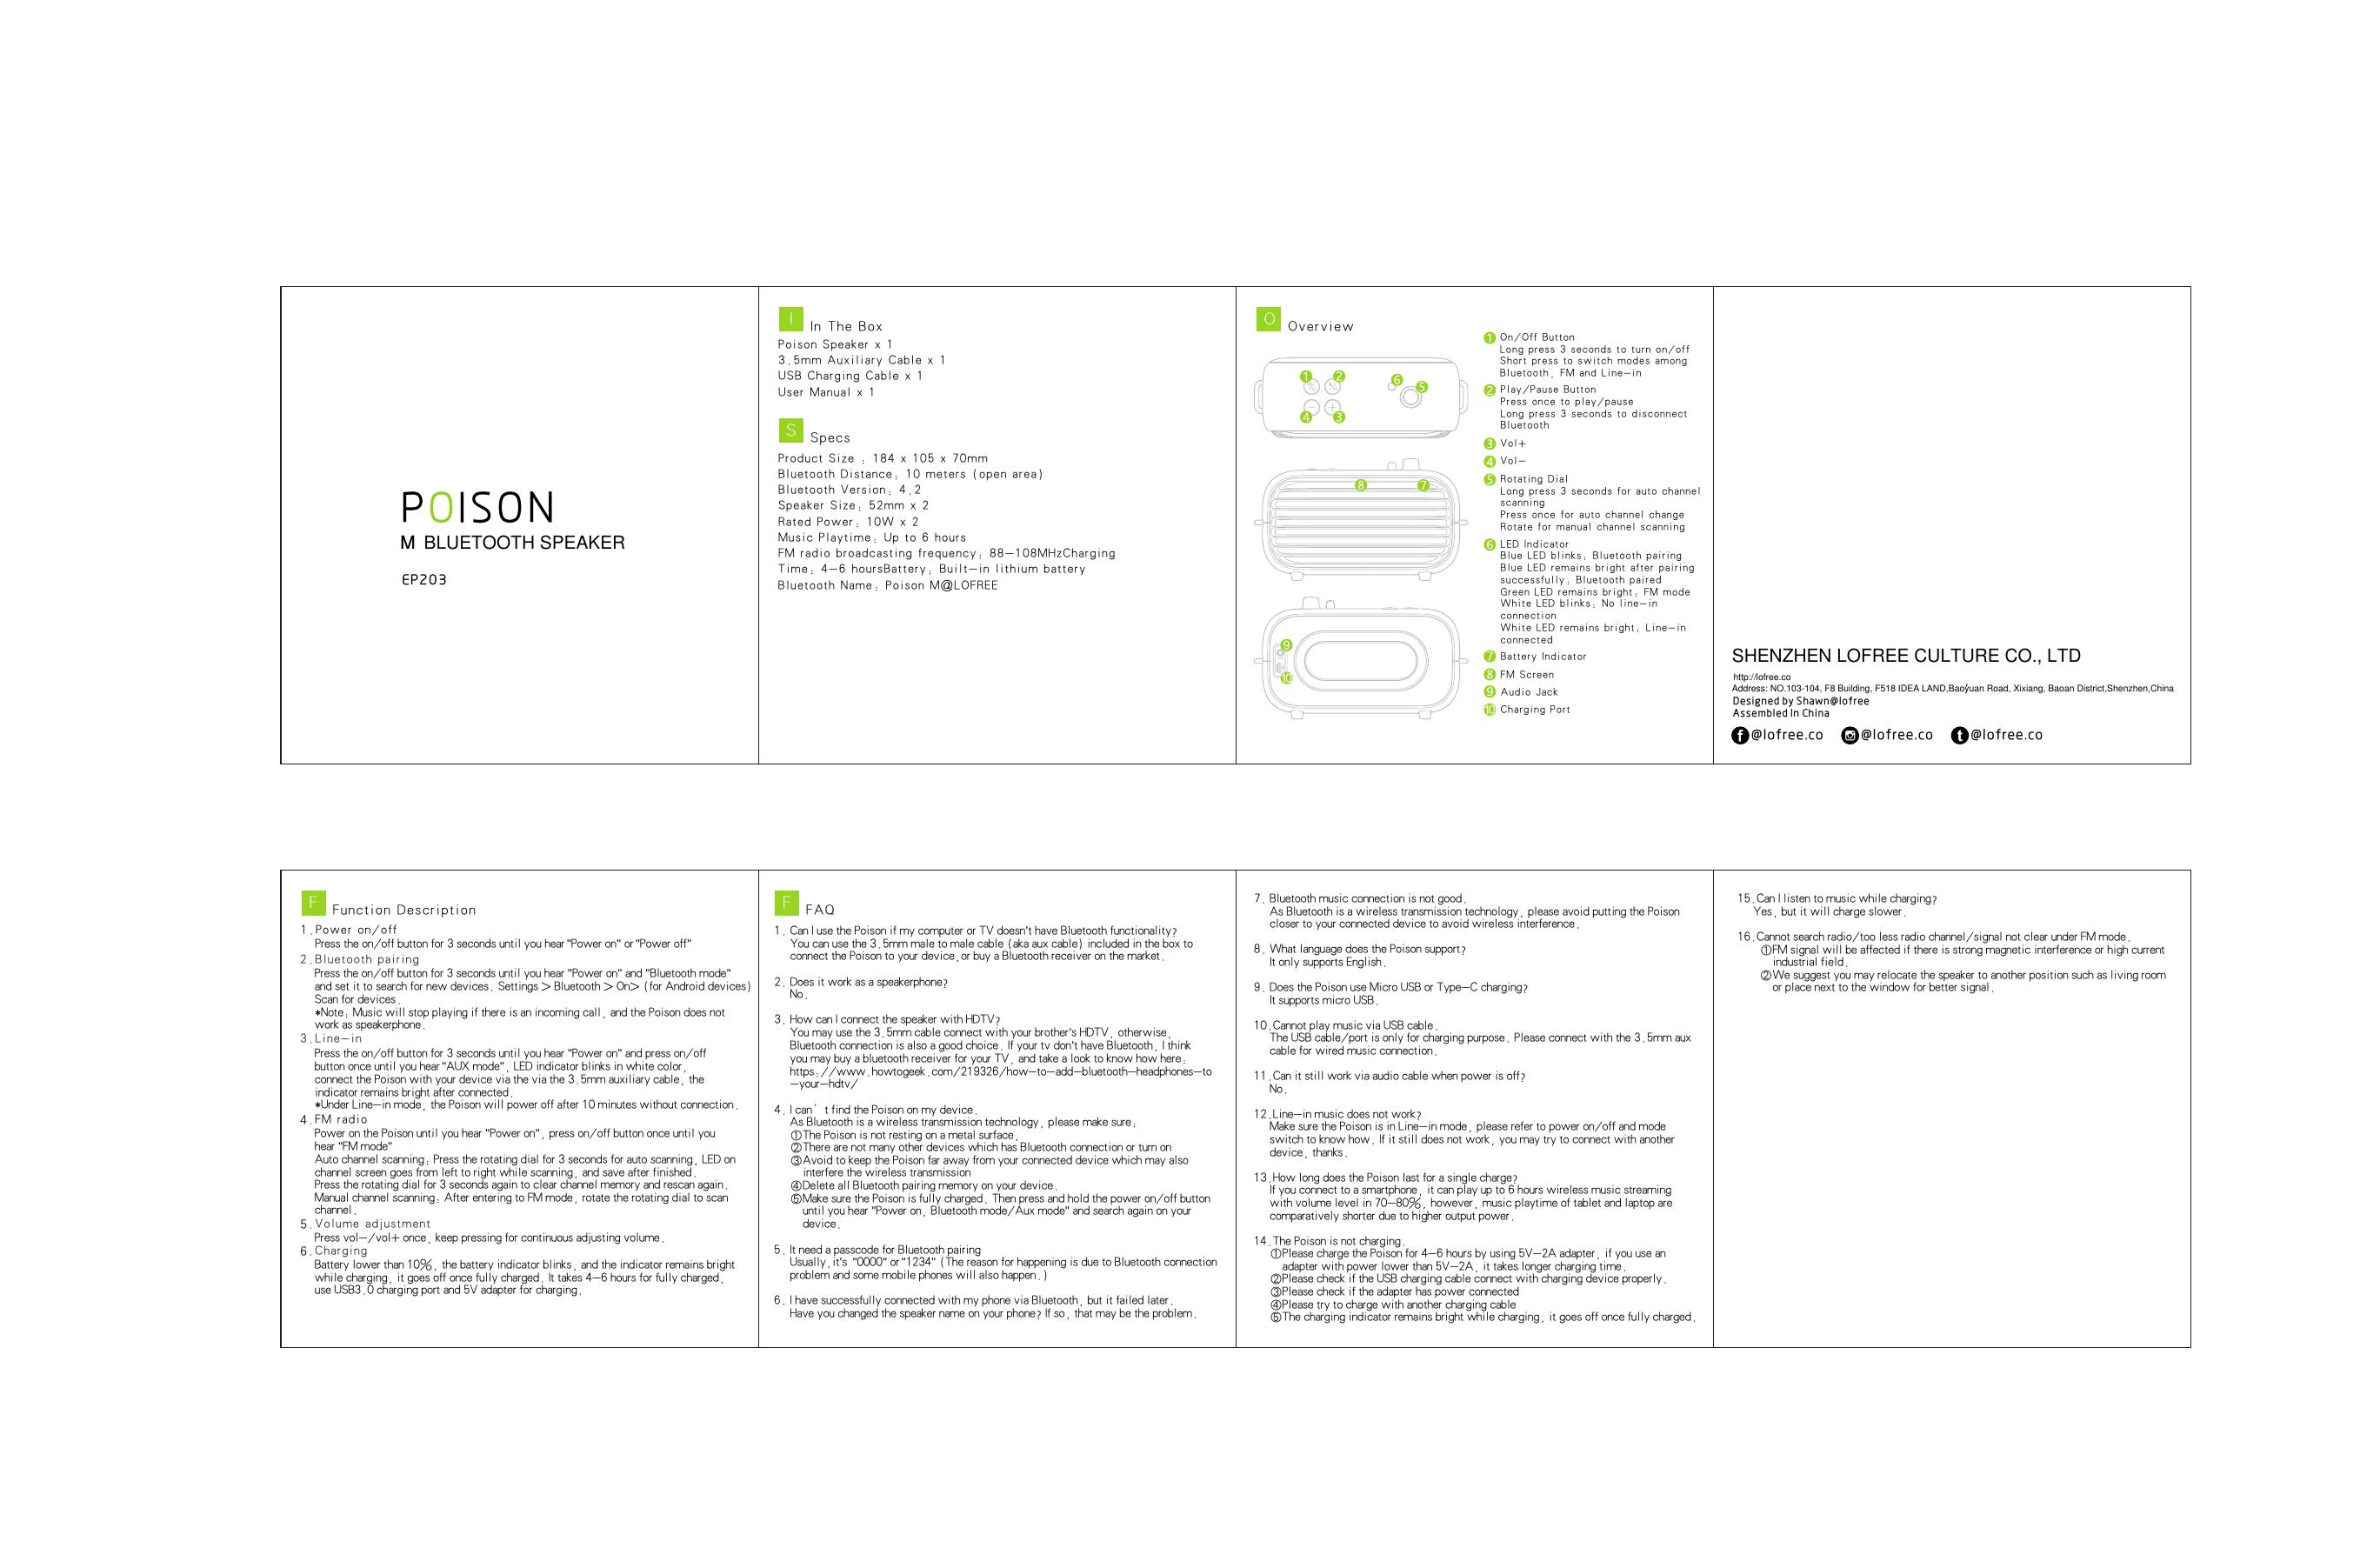 LOFREE CULTURE EP203 POISON M BLUETOOTH SPEAKER User Manual